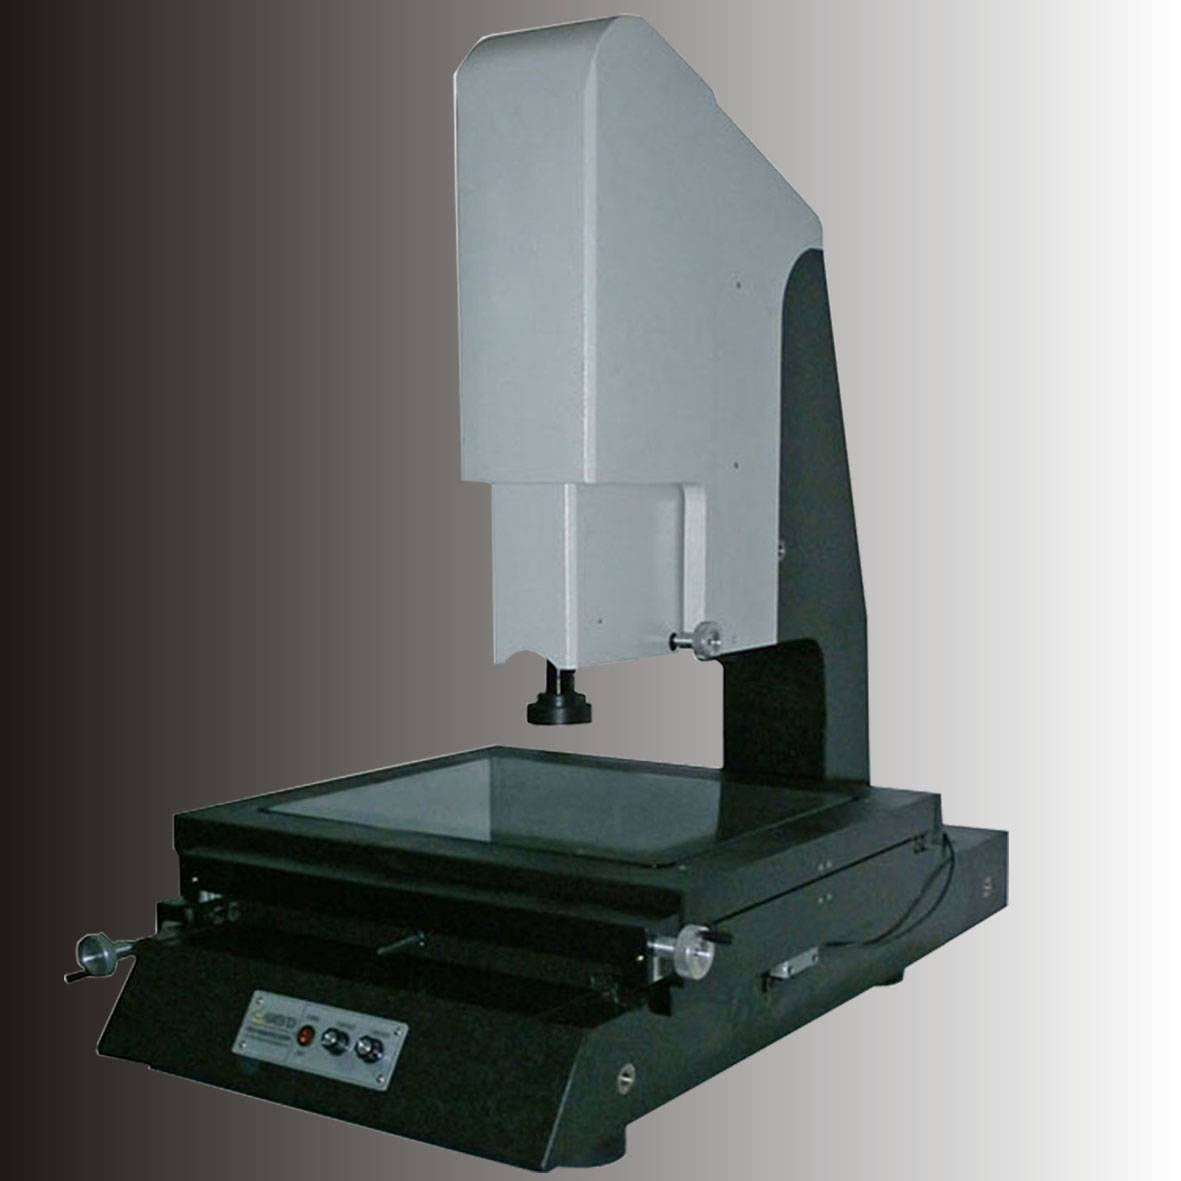 2D-SEMI-AUTOMATIC VISION MEASURE MACHINE